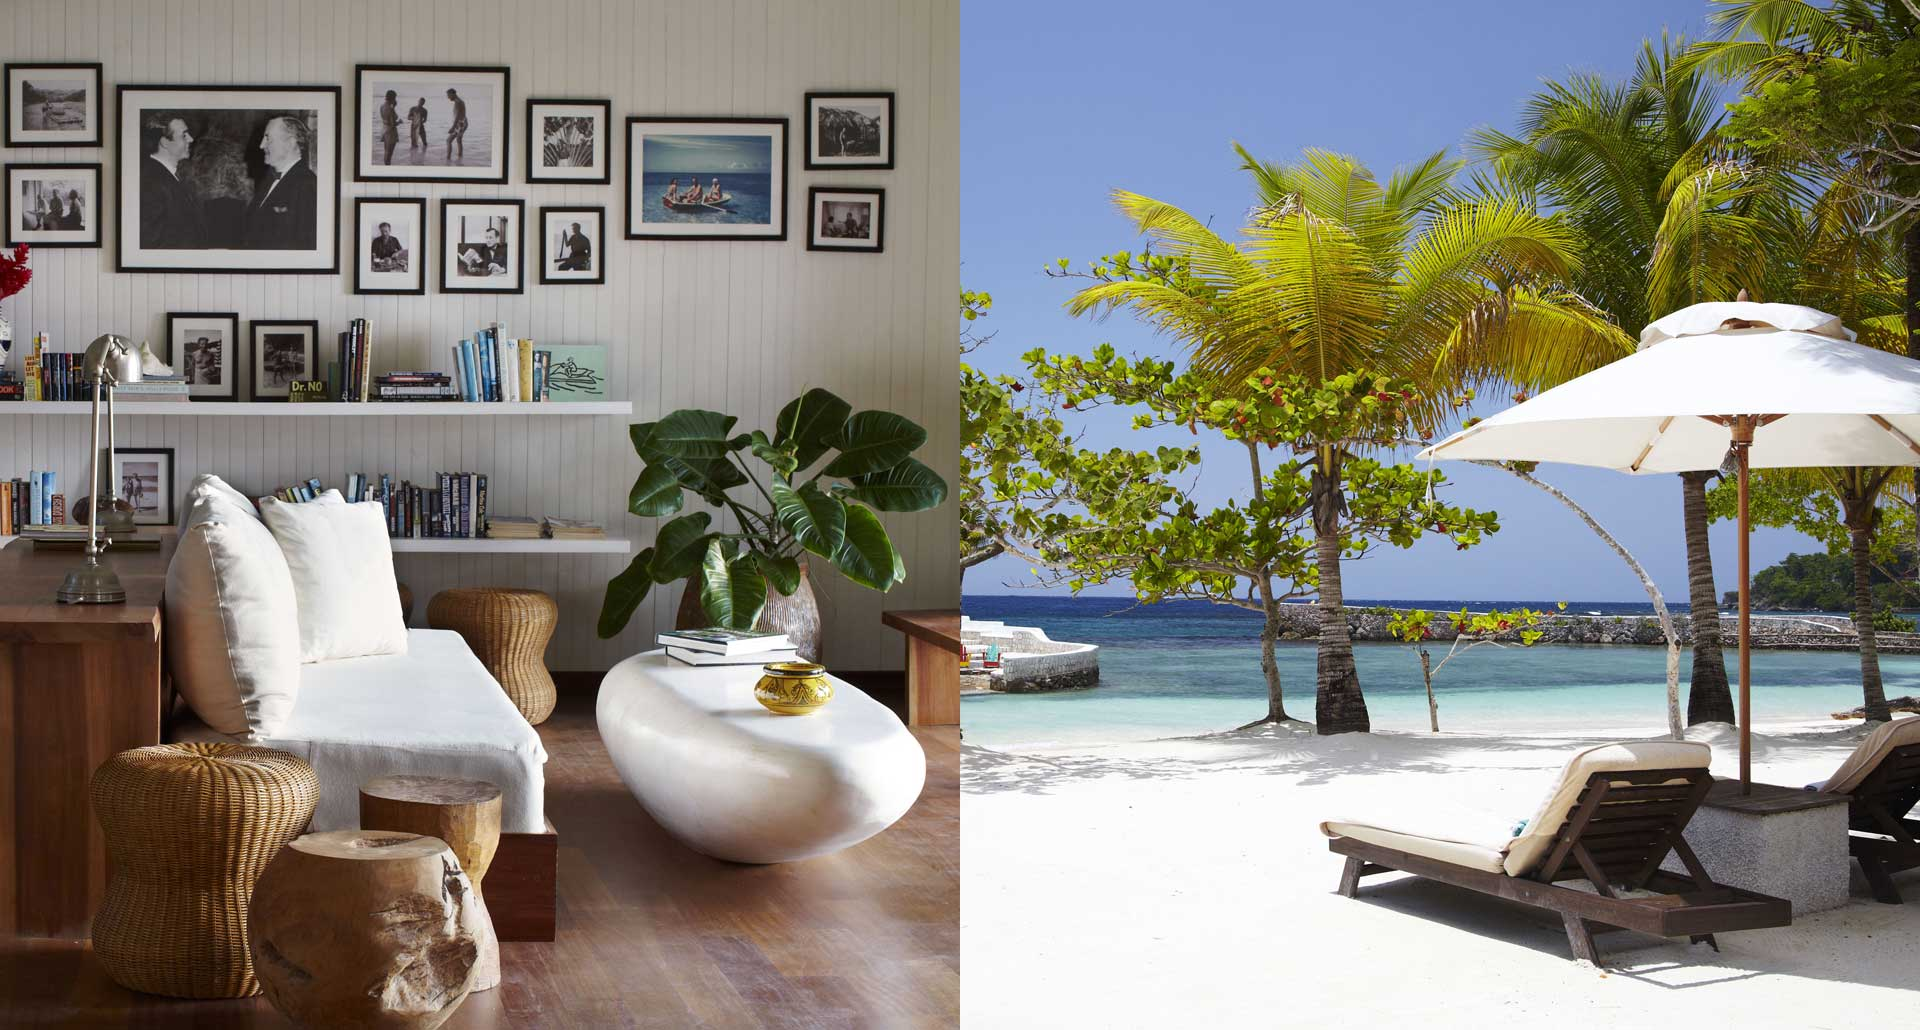 Goldeneye - boutique hotel resort in Jamaica